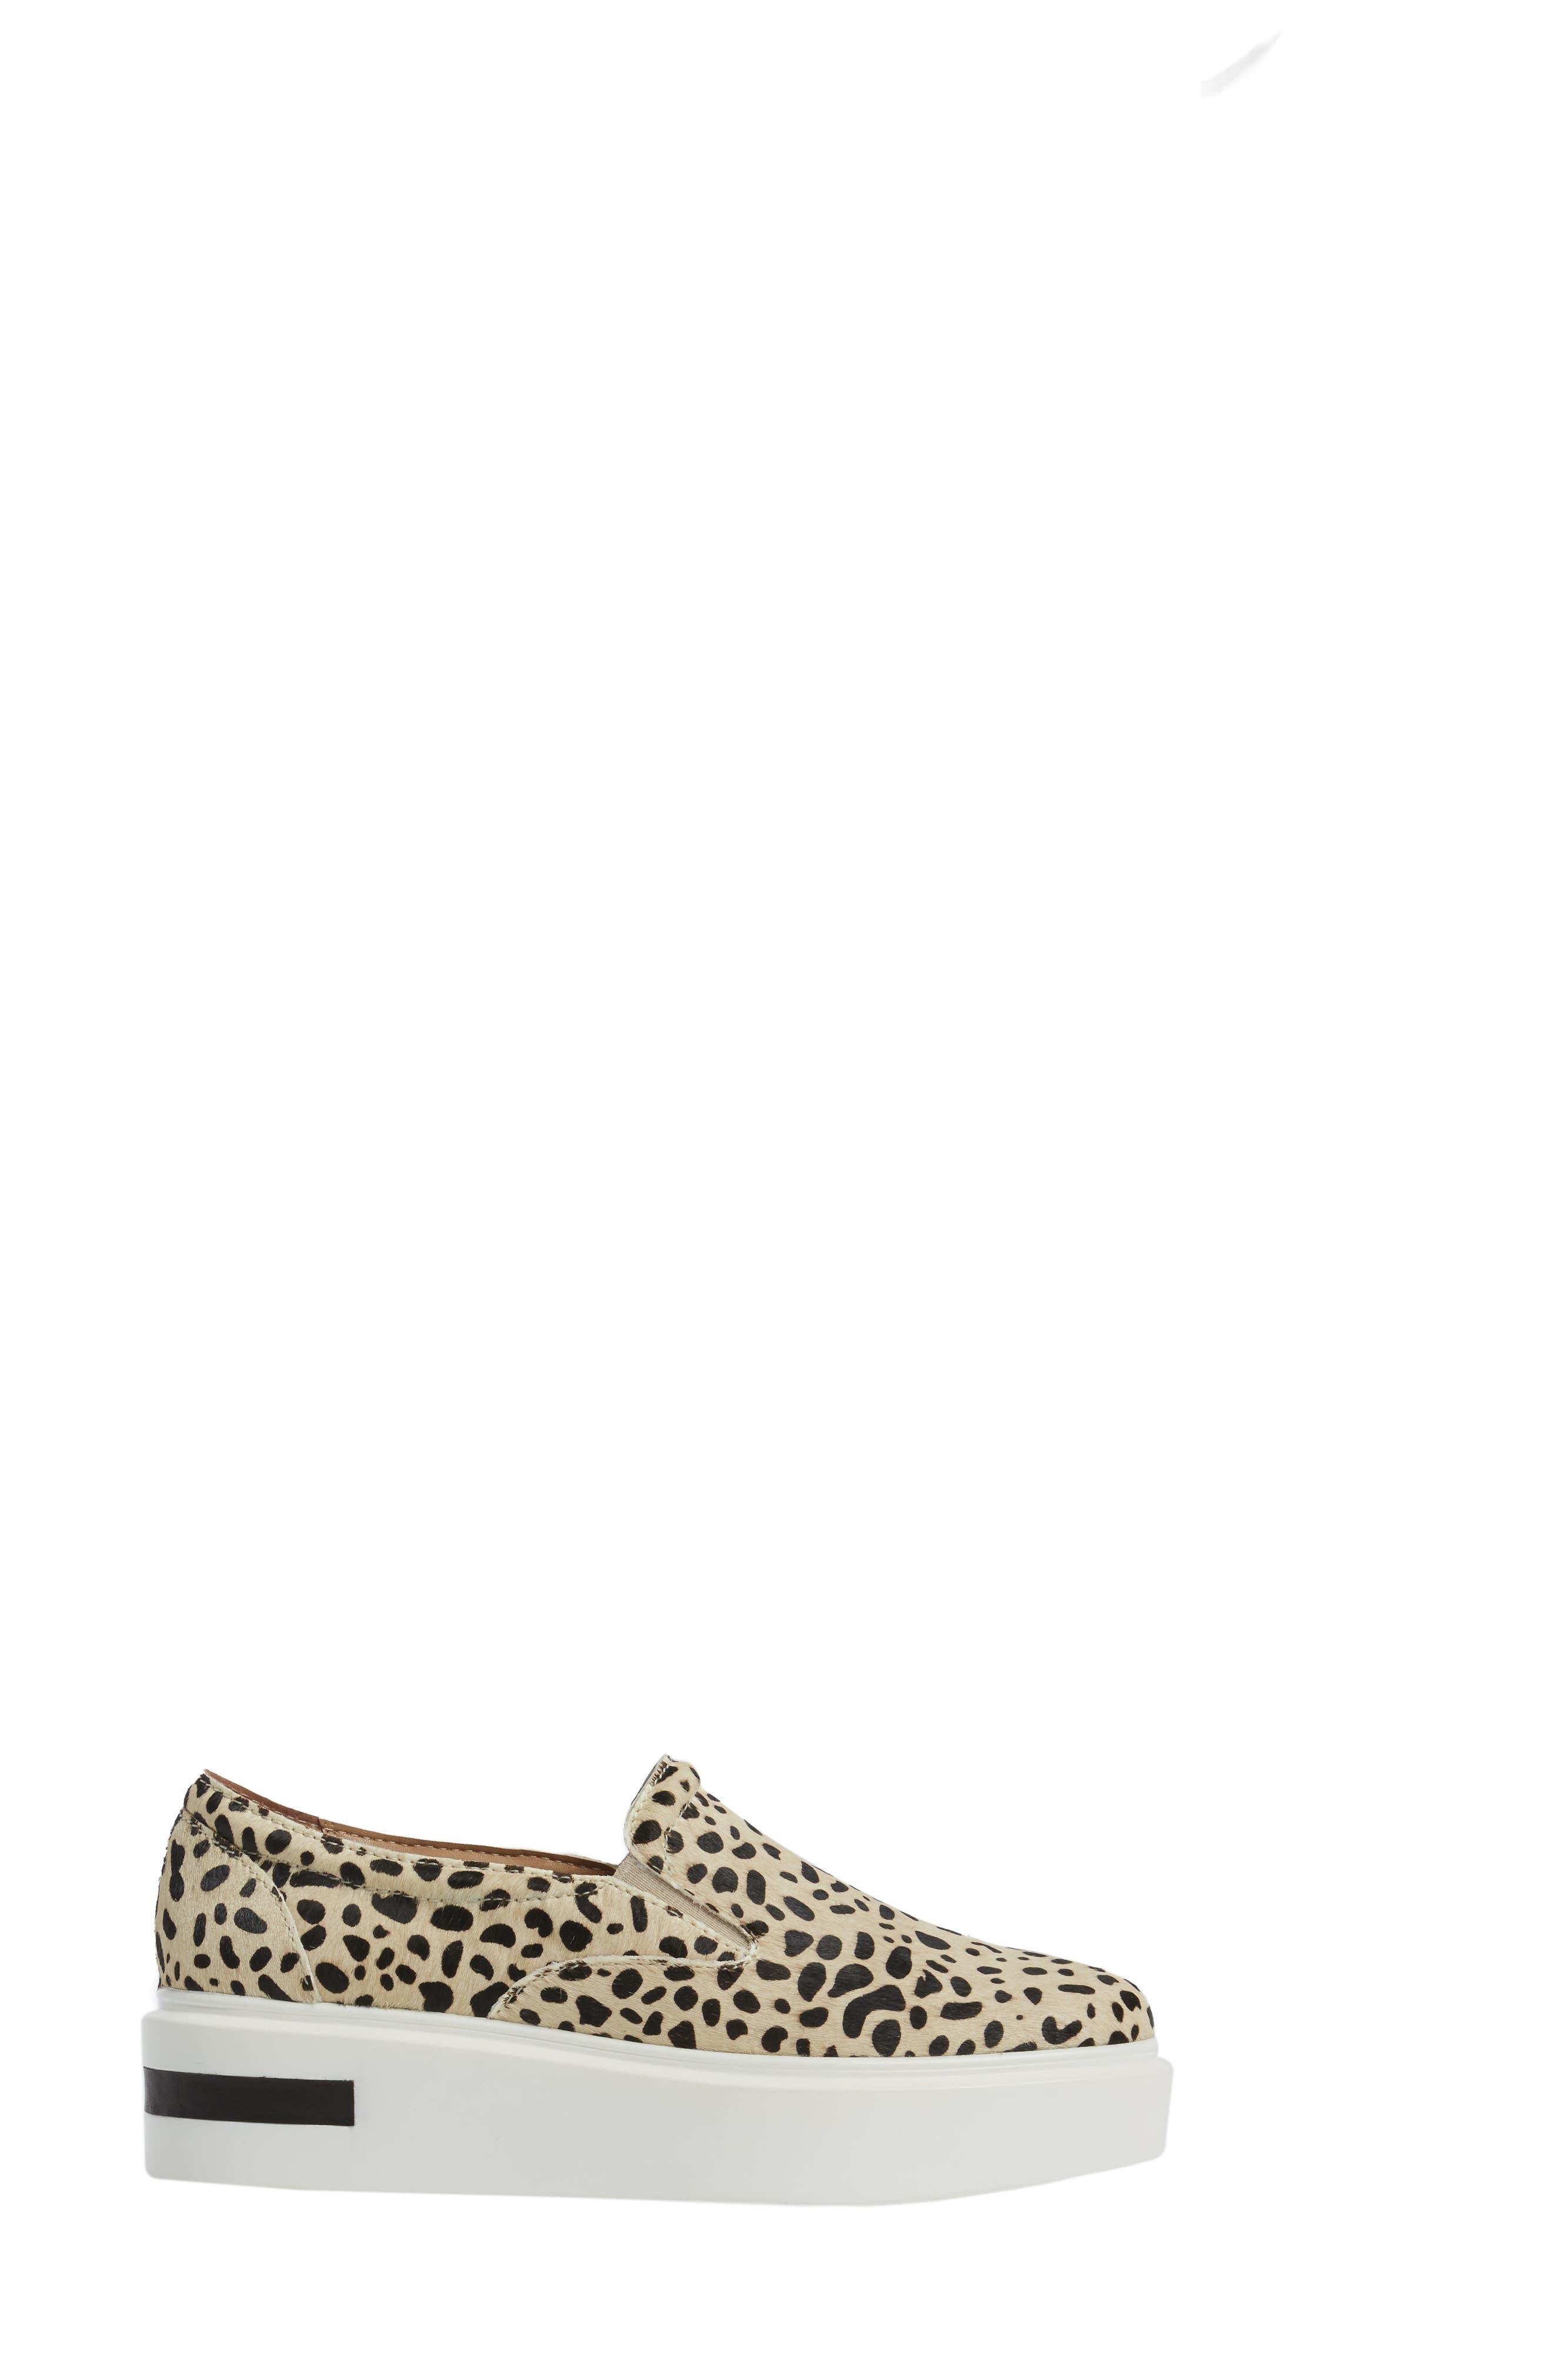 Alternate Image 3  - Linea Paolo Fairfax II Genuine Calf Hair Platform Sneaker (Women)